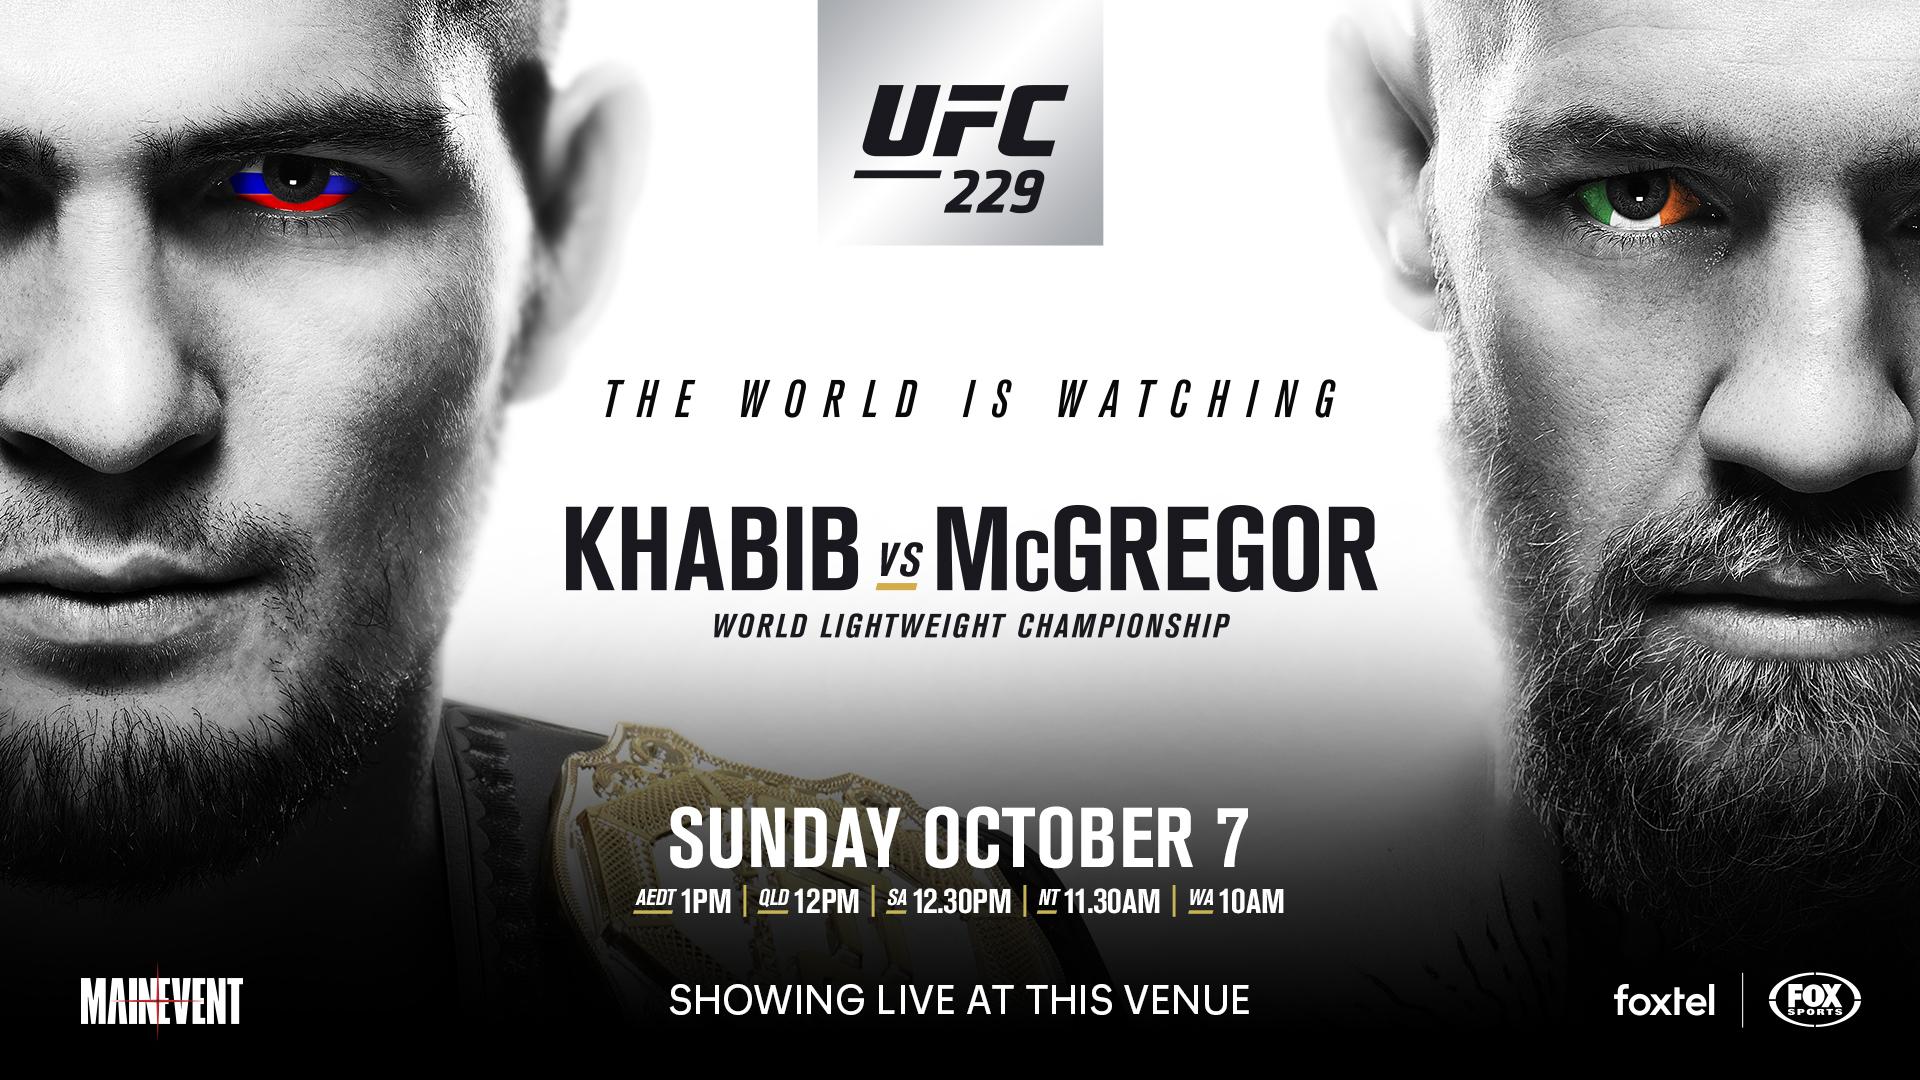 UFC 229 Khabib vs McGregor The Cove Hotel 1920x1080